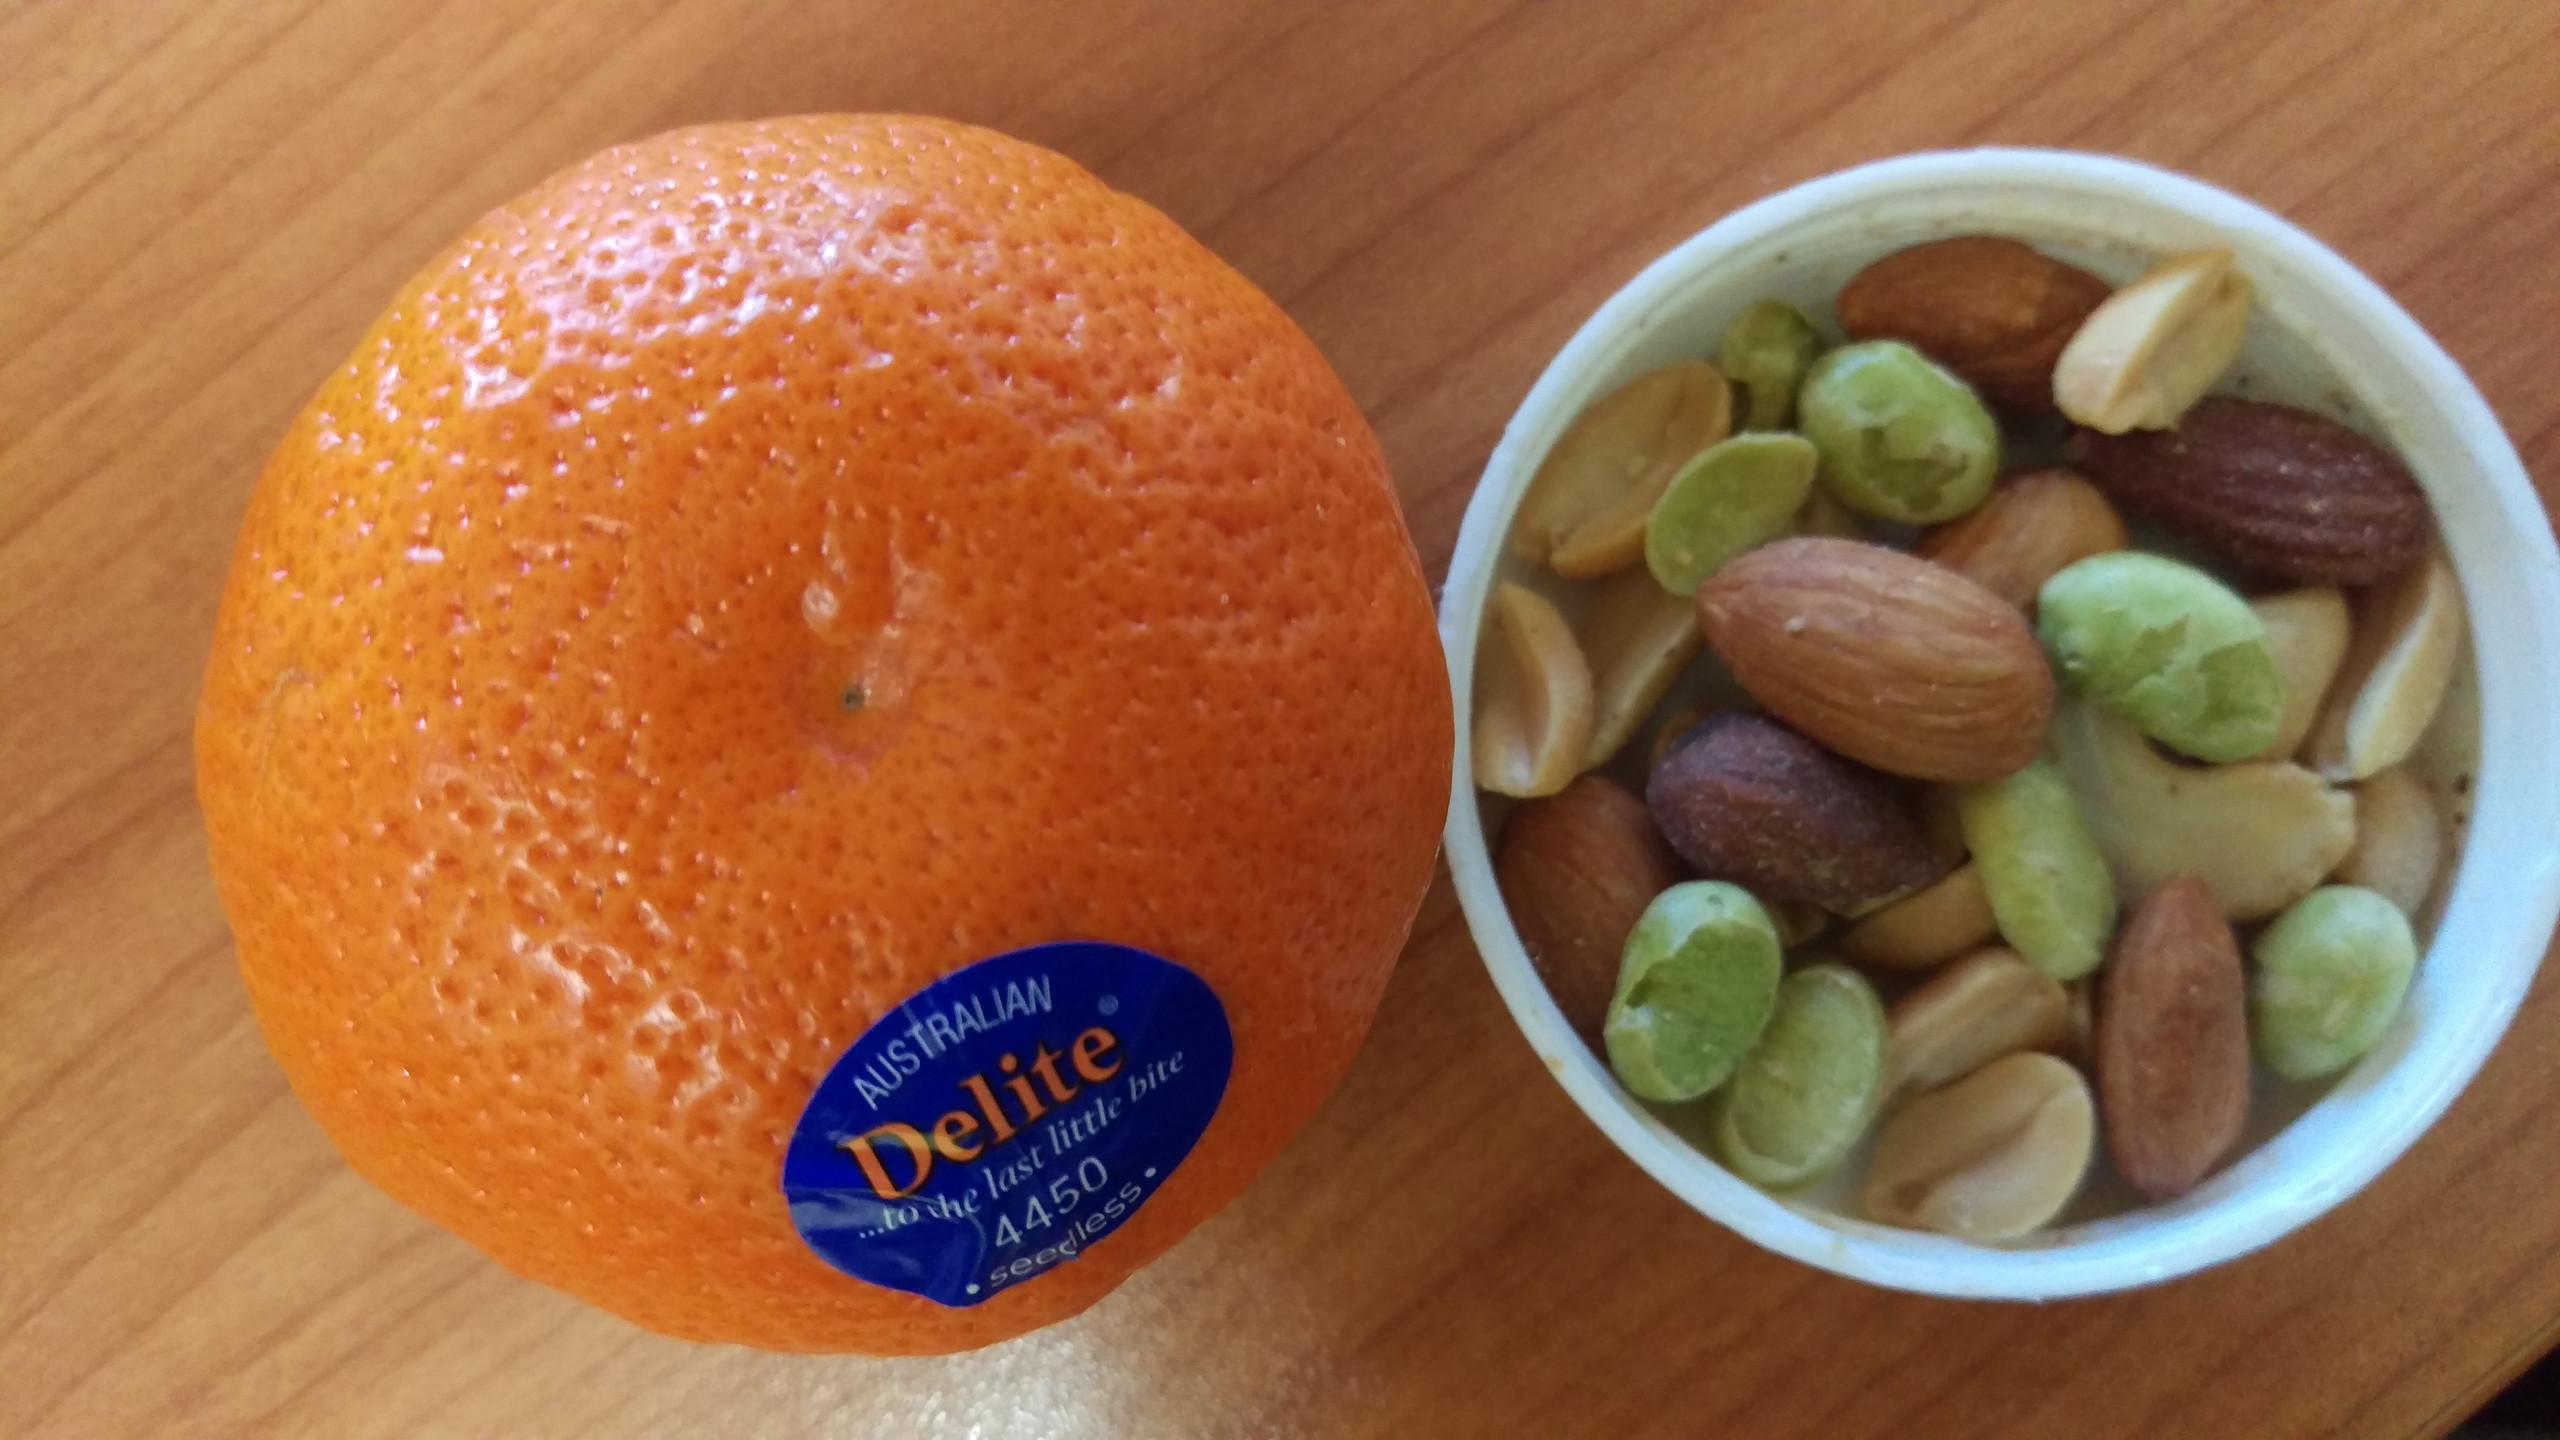 mandarine and nut mix